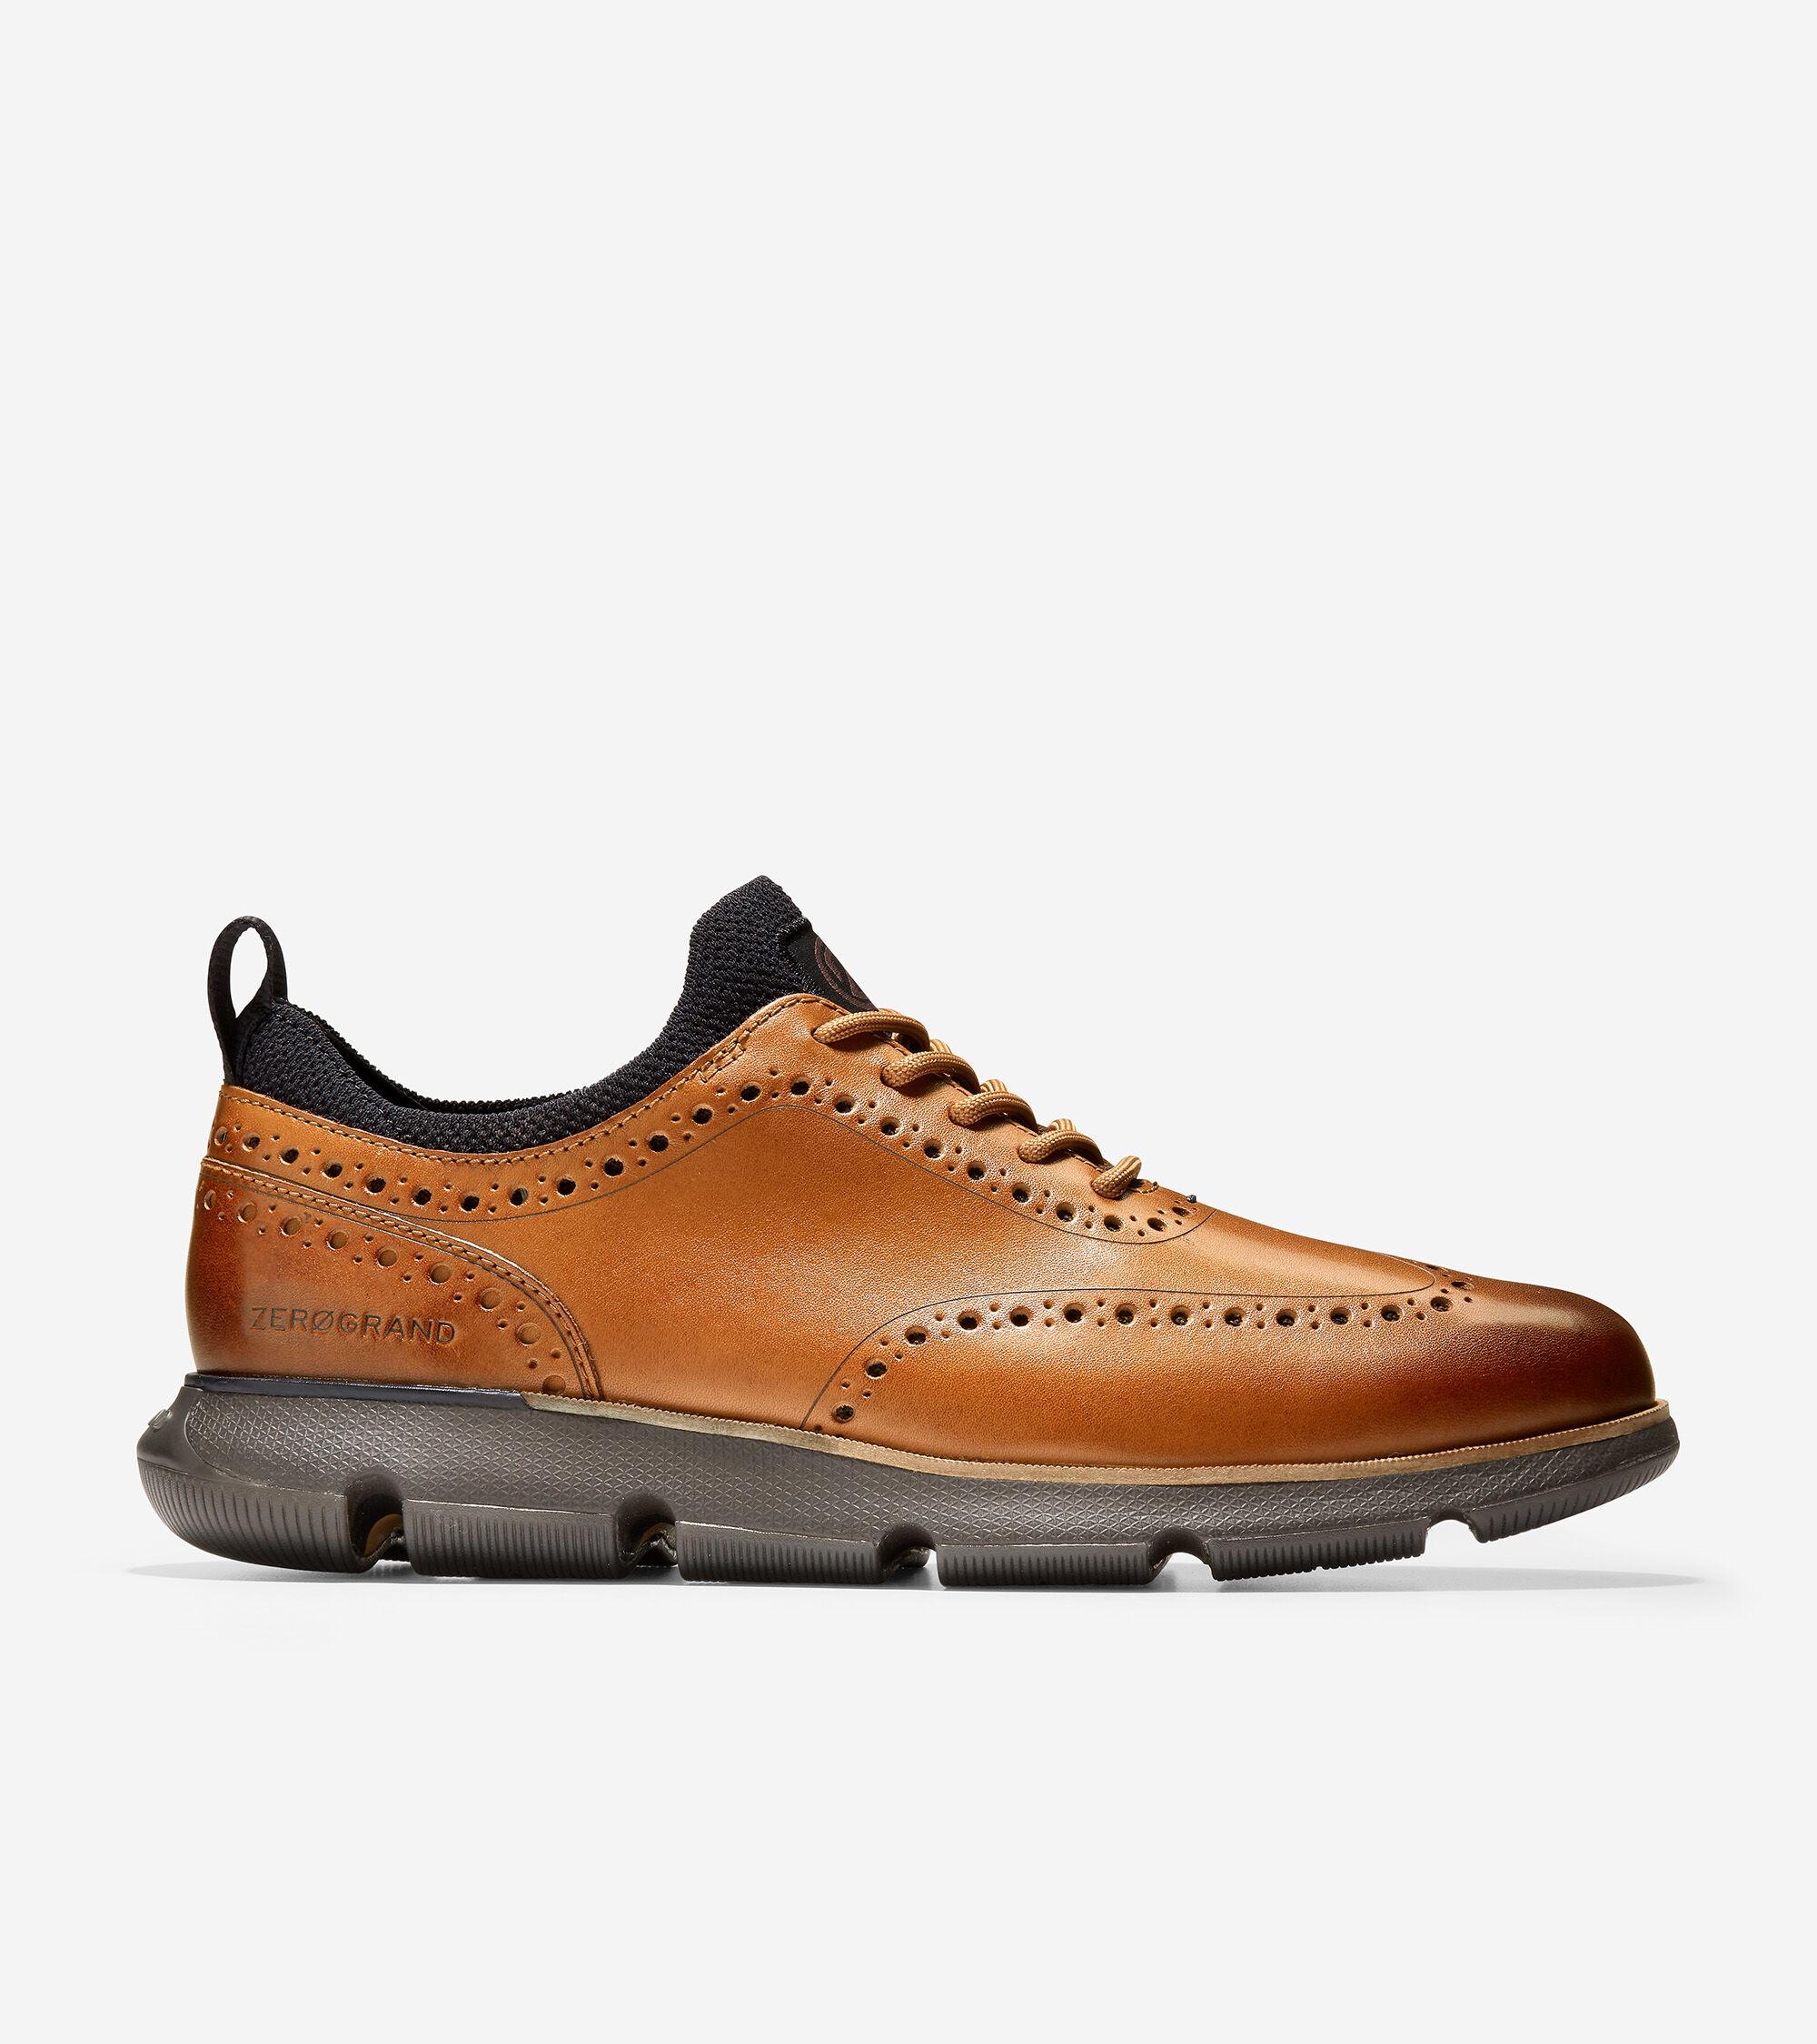 Men's New Arrivals | Boots, Oxfords